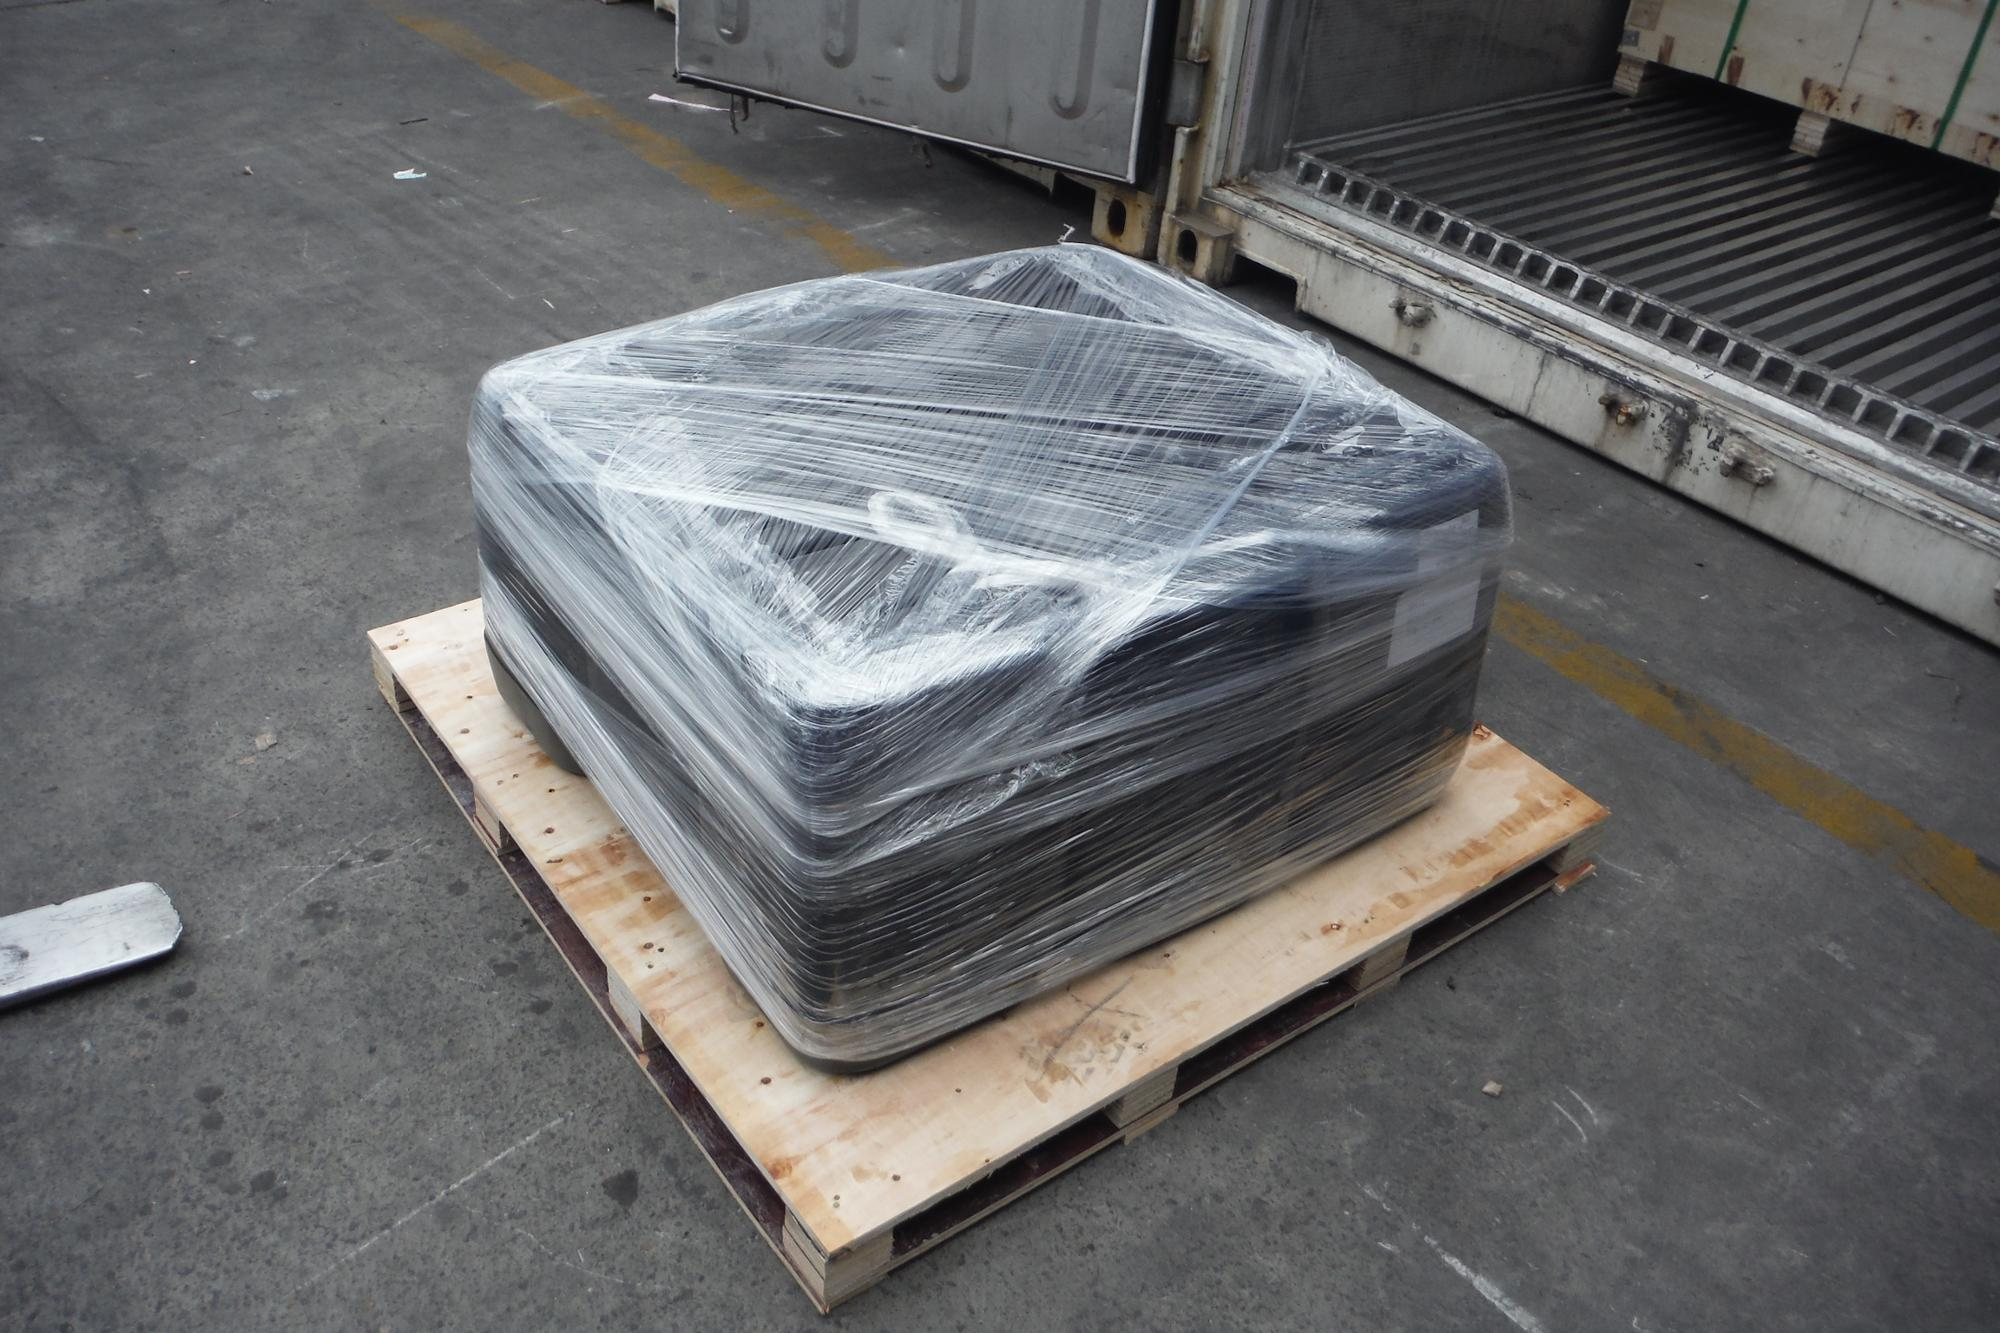 UV Liquid1173 2-Hydroxy-2-methylpropiophenone 7473-98-5 Photoinitiator 1173